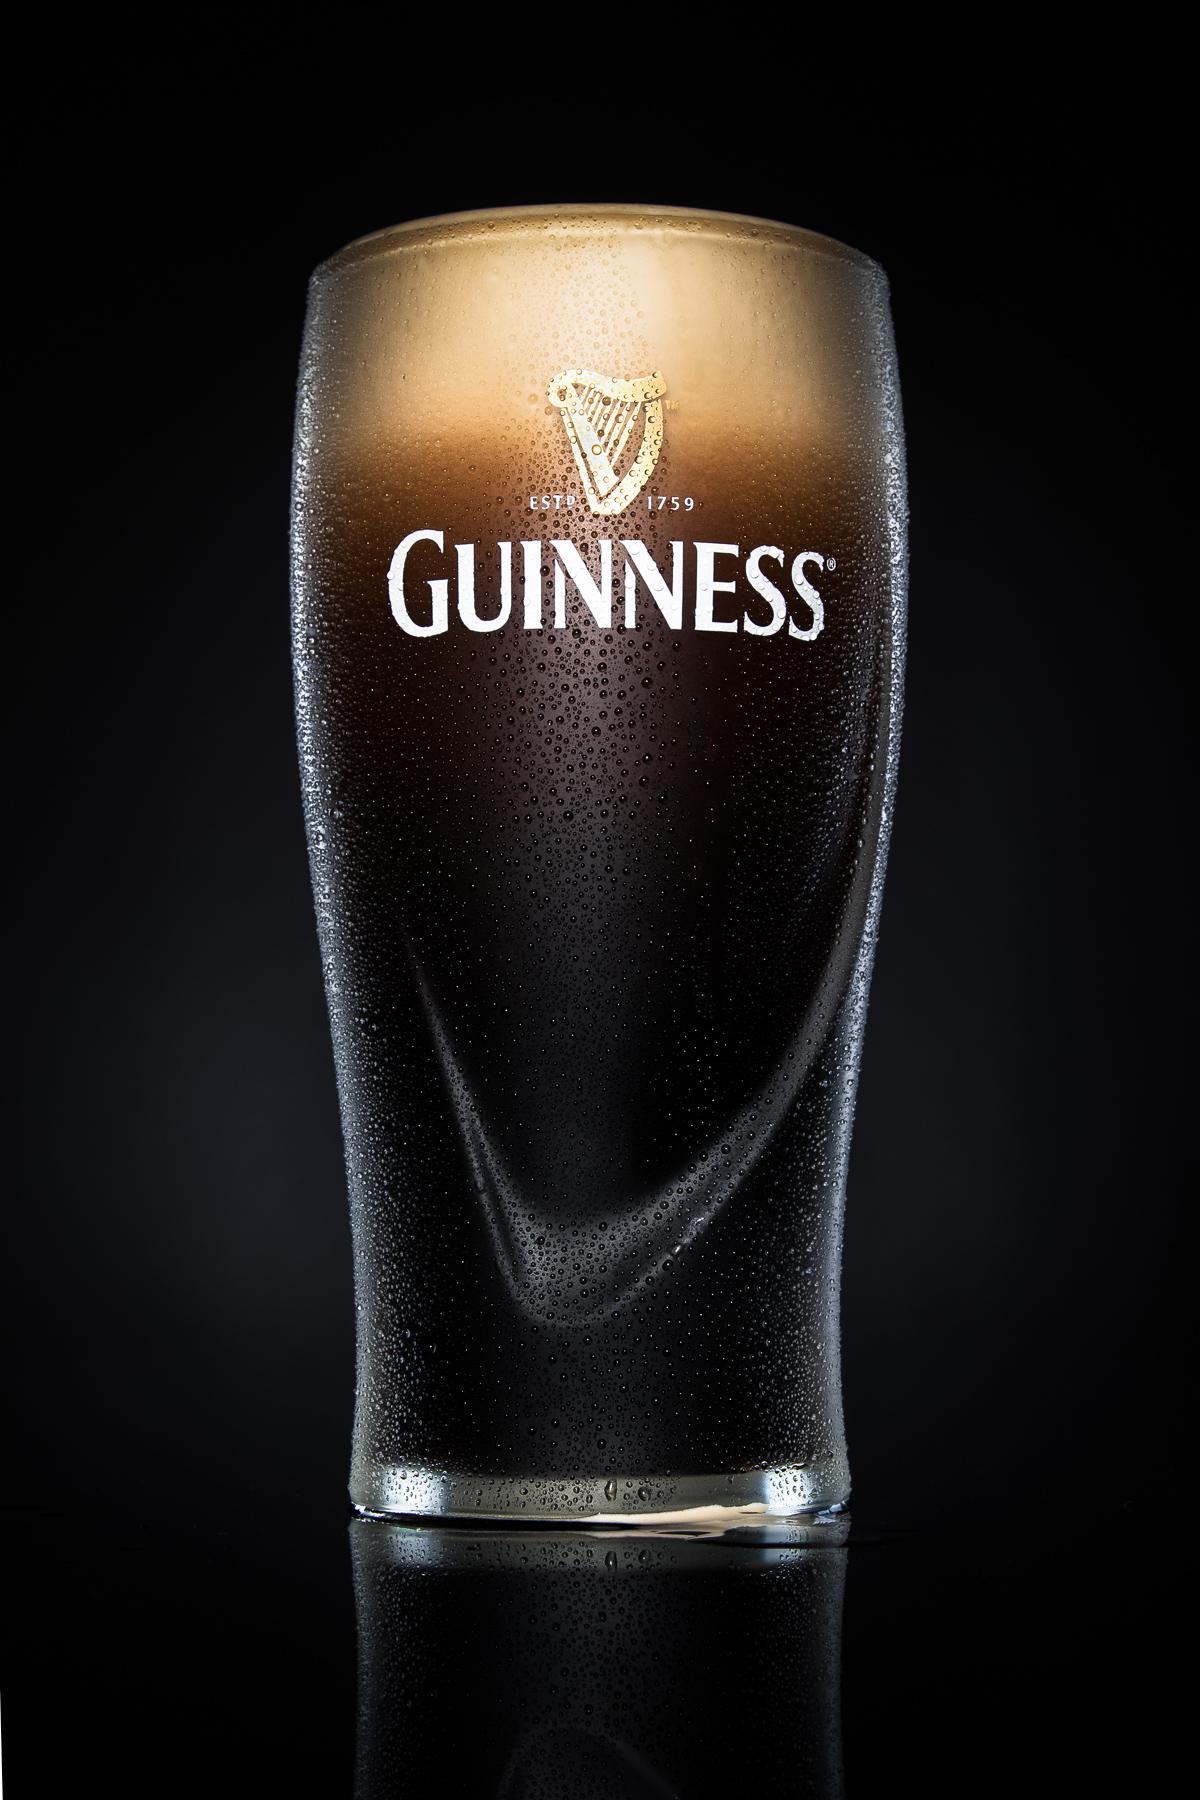 Guinness draught pint